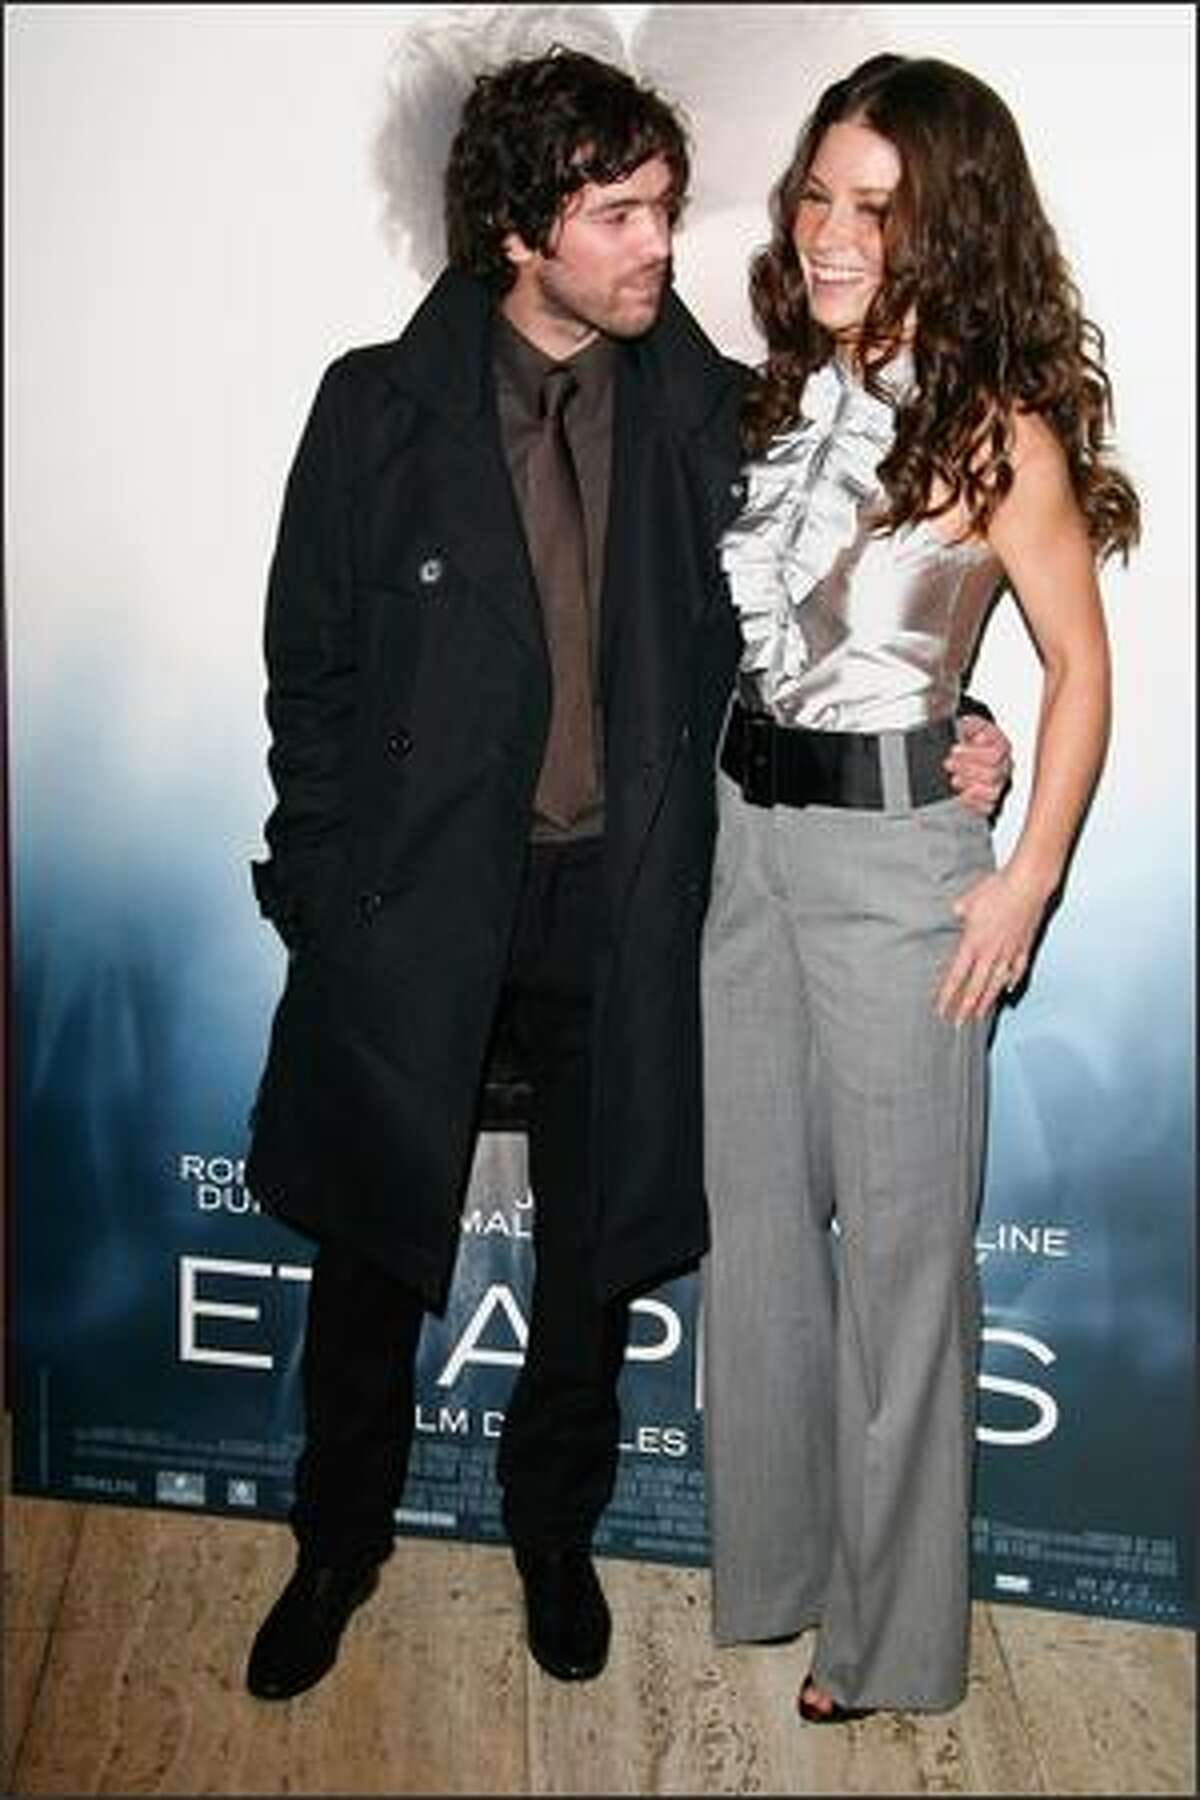 Romain Duris (L) and Evangeline Lilly attend the 'Et Apres' Paris premiere at the Gaumont ambassade cinema on Monday in Paris, France.